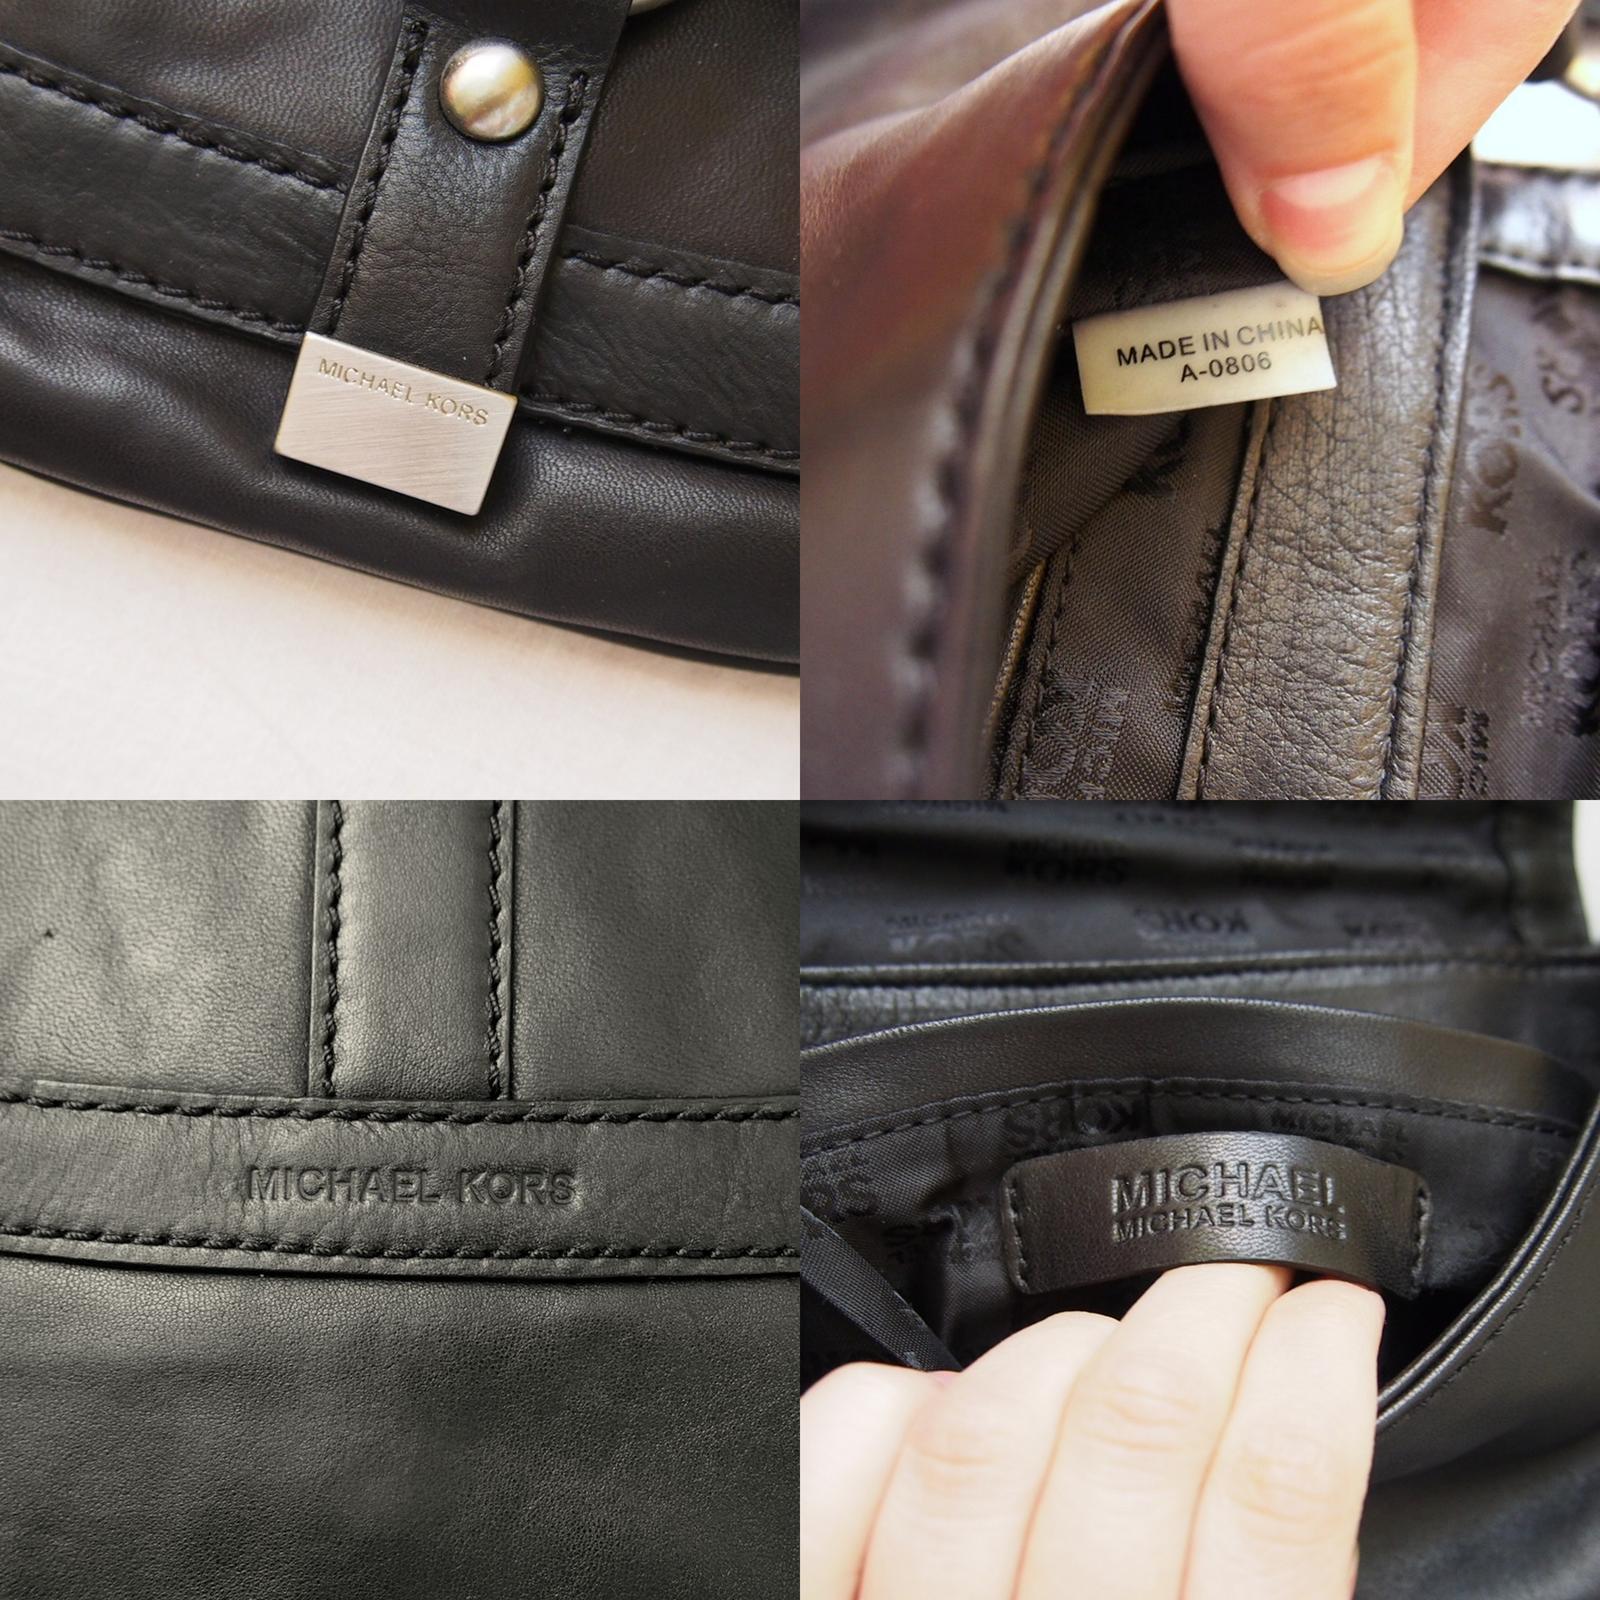 Michael Kors Rock Chic Crossbody Bag - Obrázok č. 2